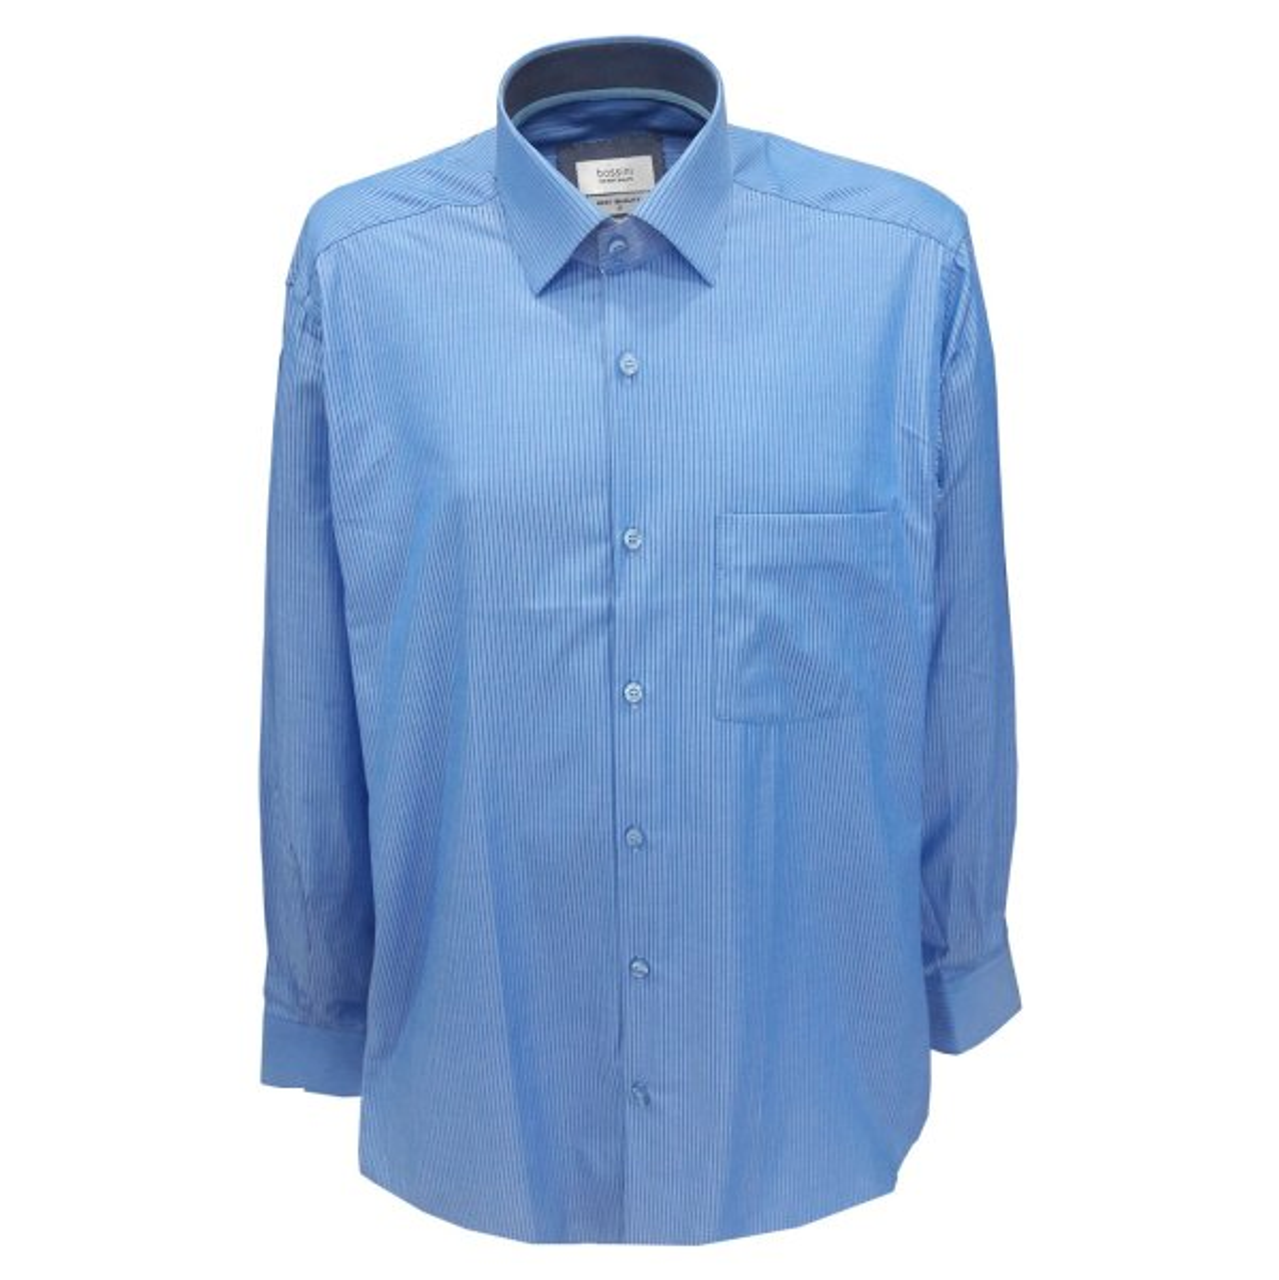 پیراهن مردانه بوسینی کد RR-9